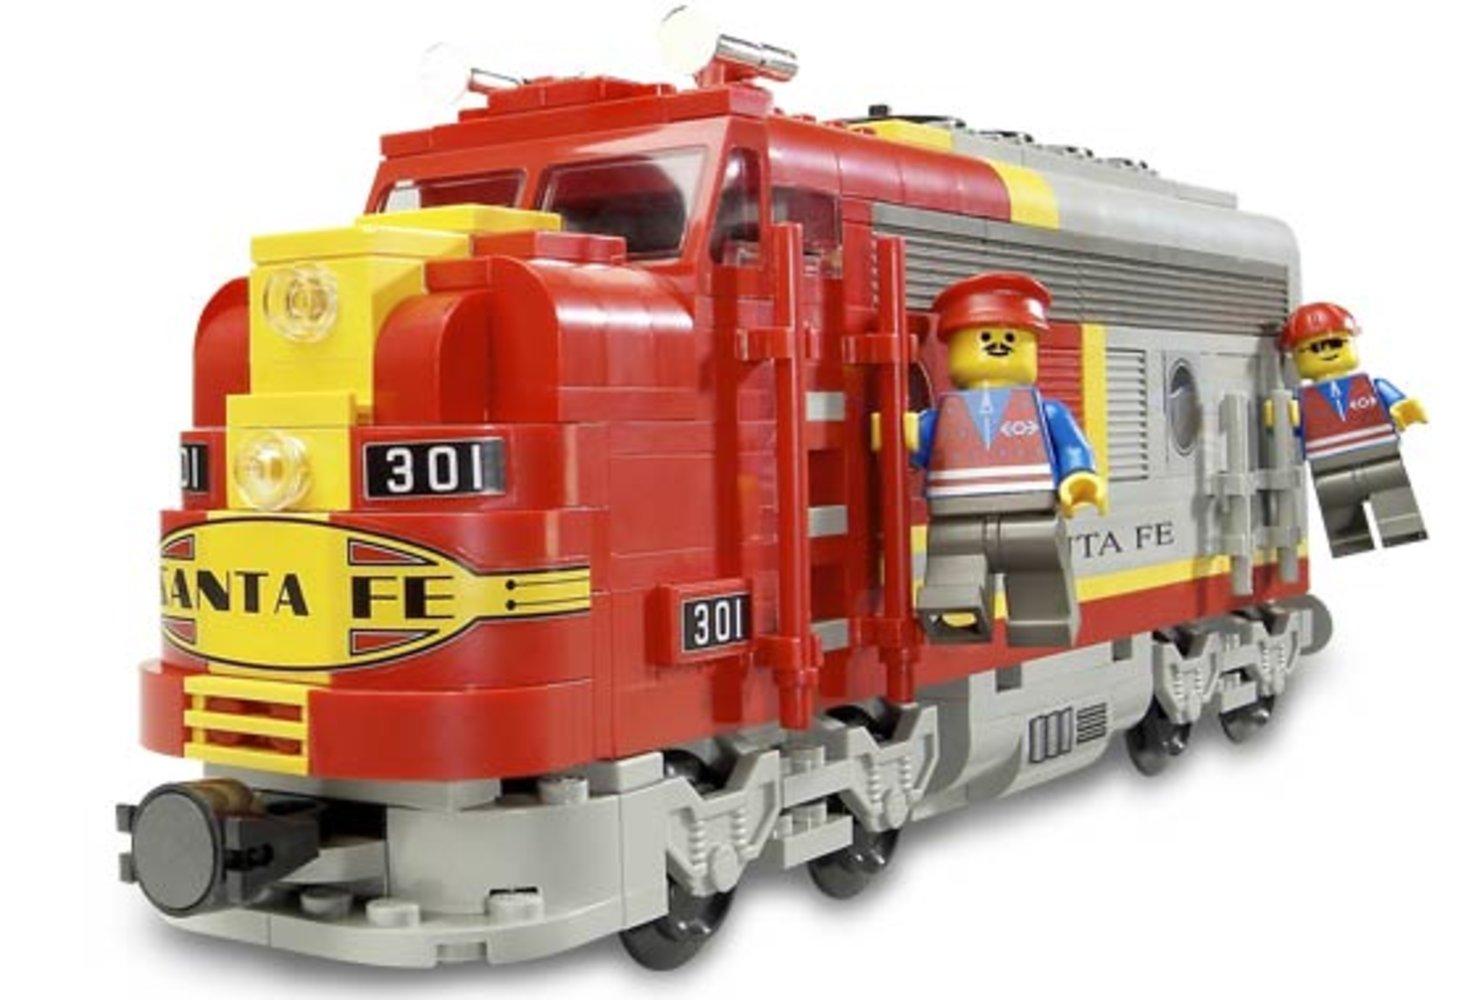 Santa Fe Super Chief - Limited Edition